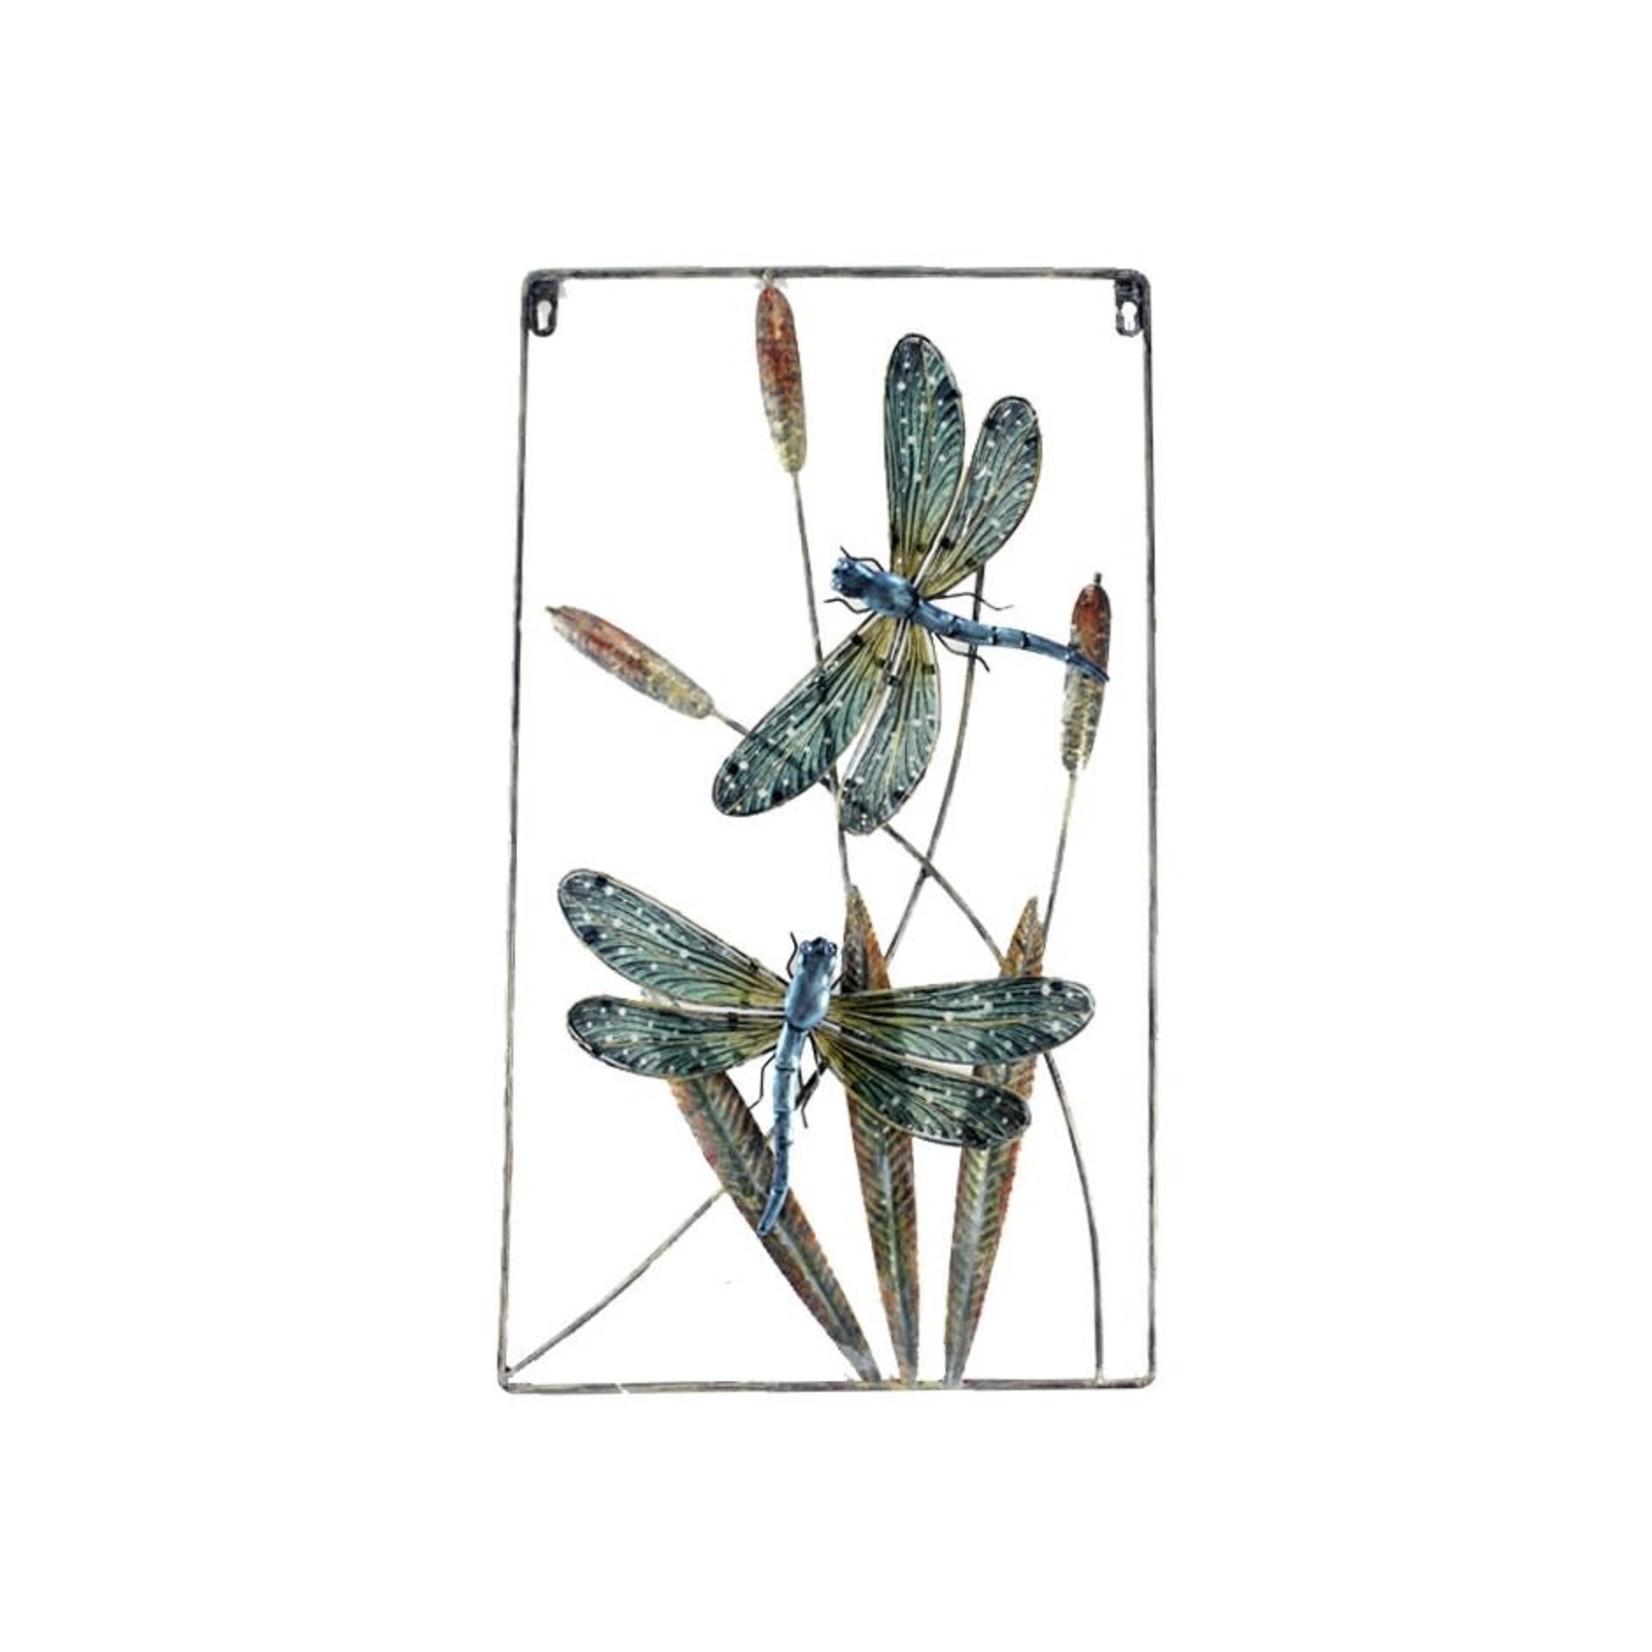 Dragonfly Wall Art